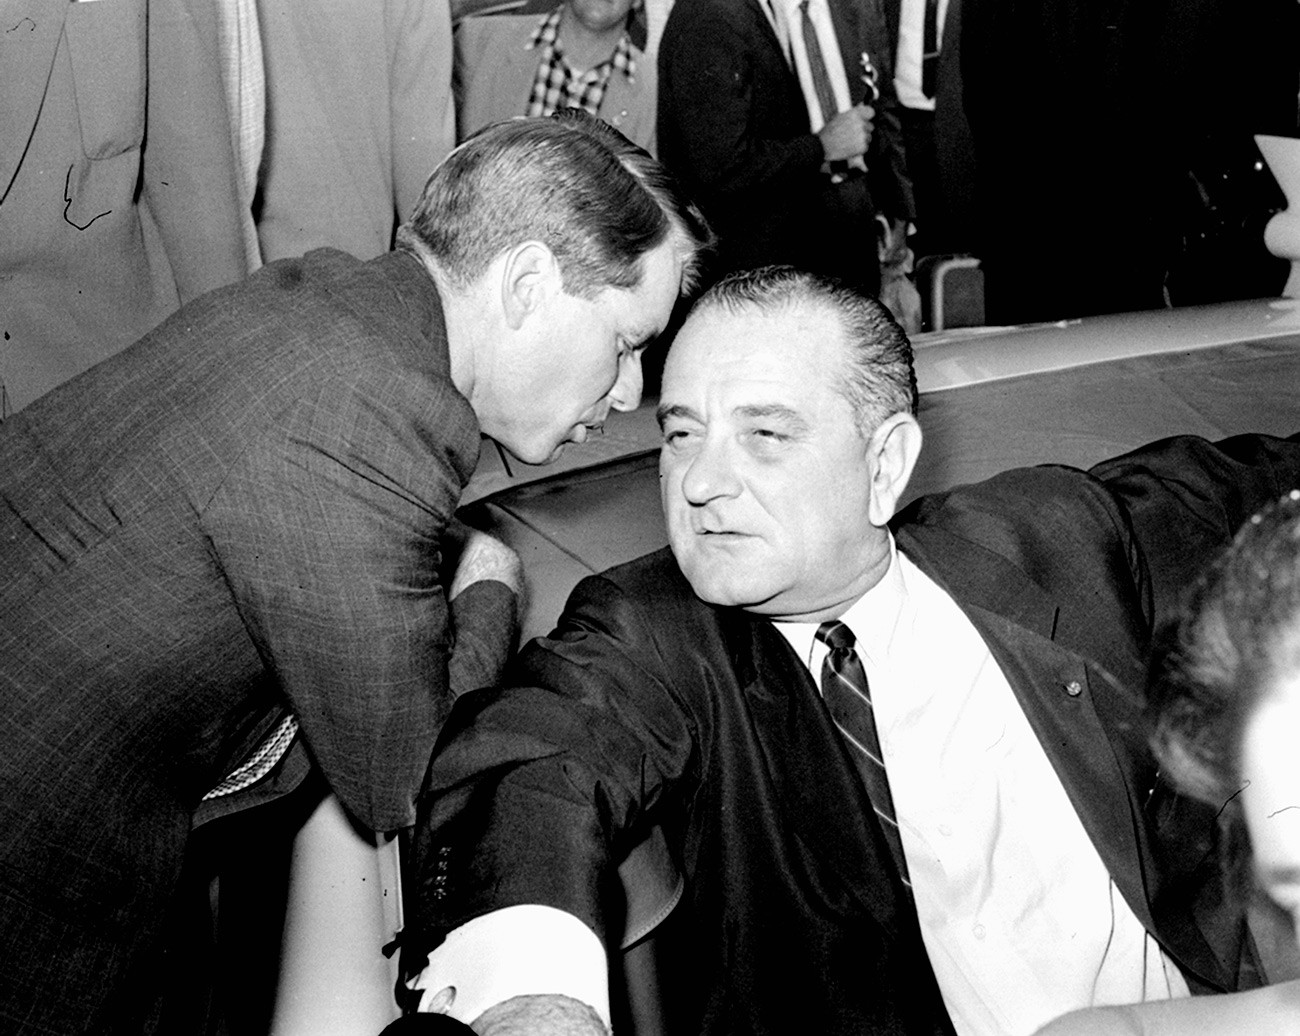 Брат Джона Кеннеди, Роберт Кеннеди, и вице-президент Линдон Б. Джонсон